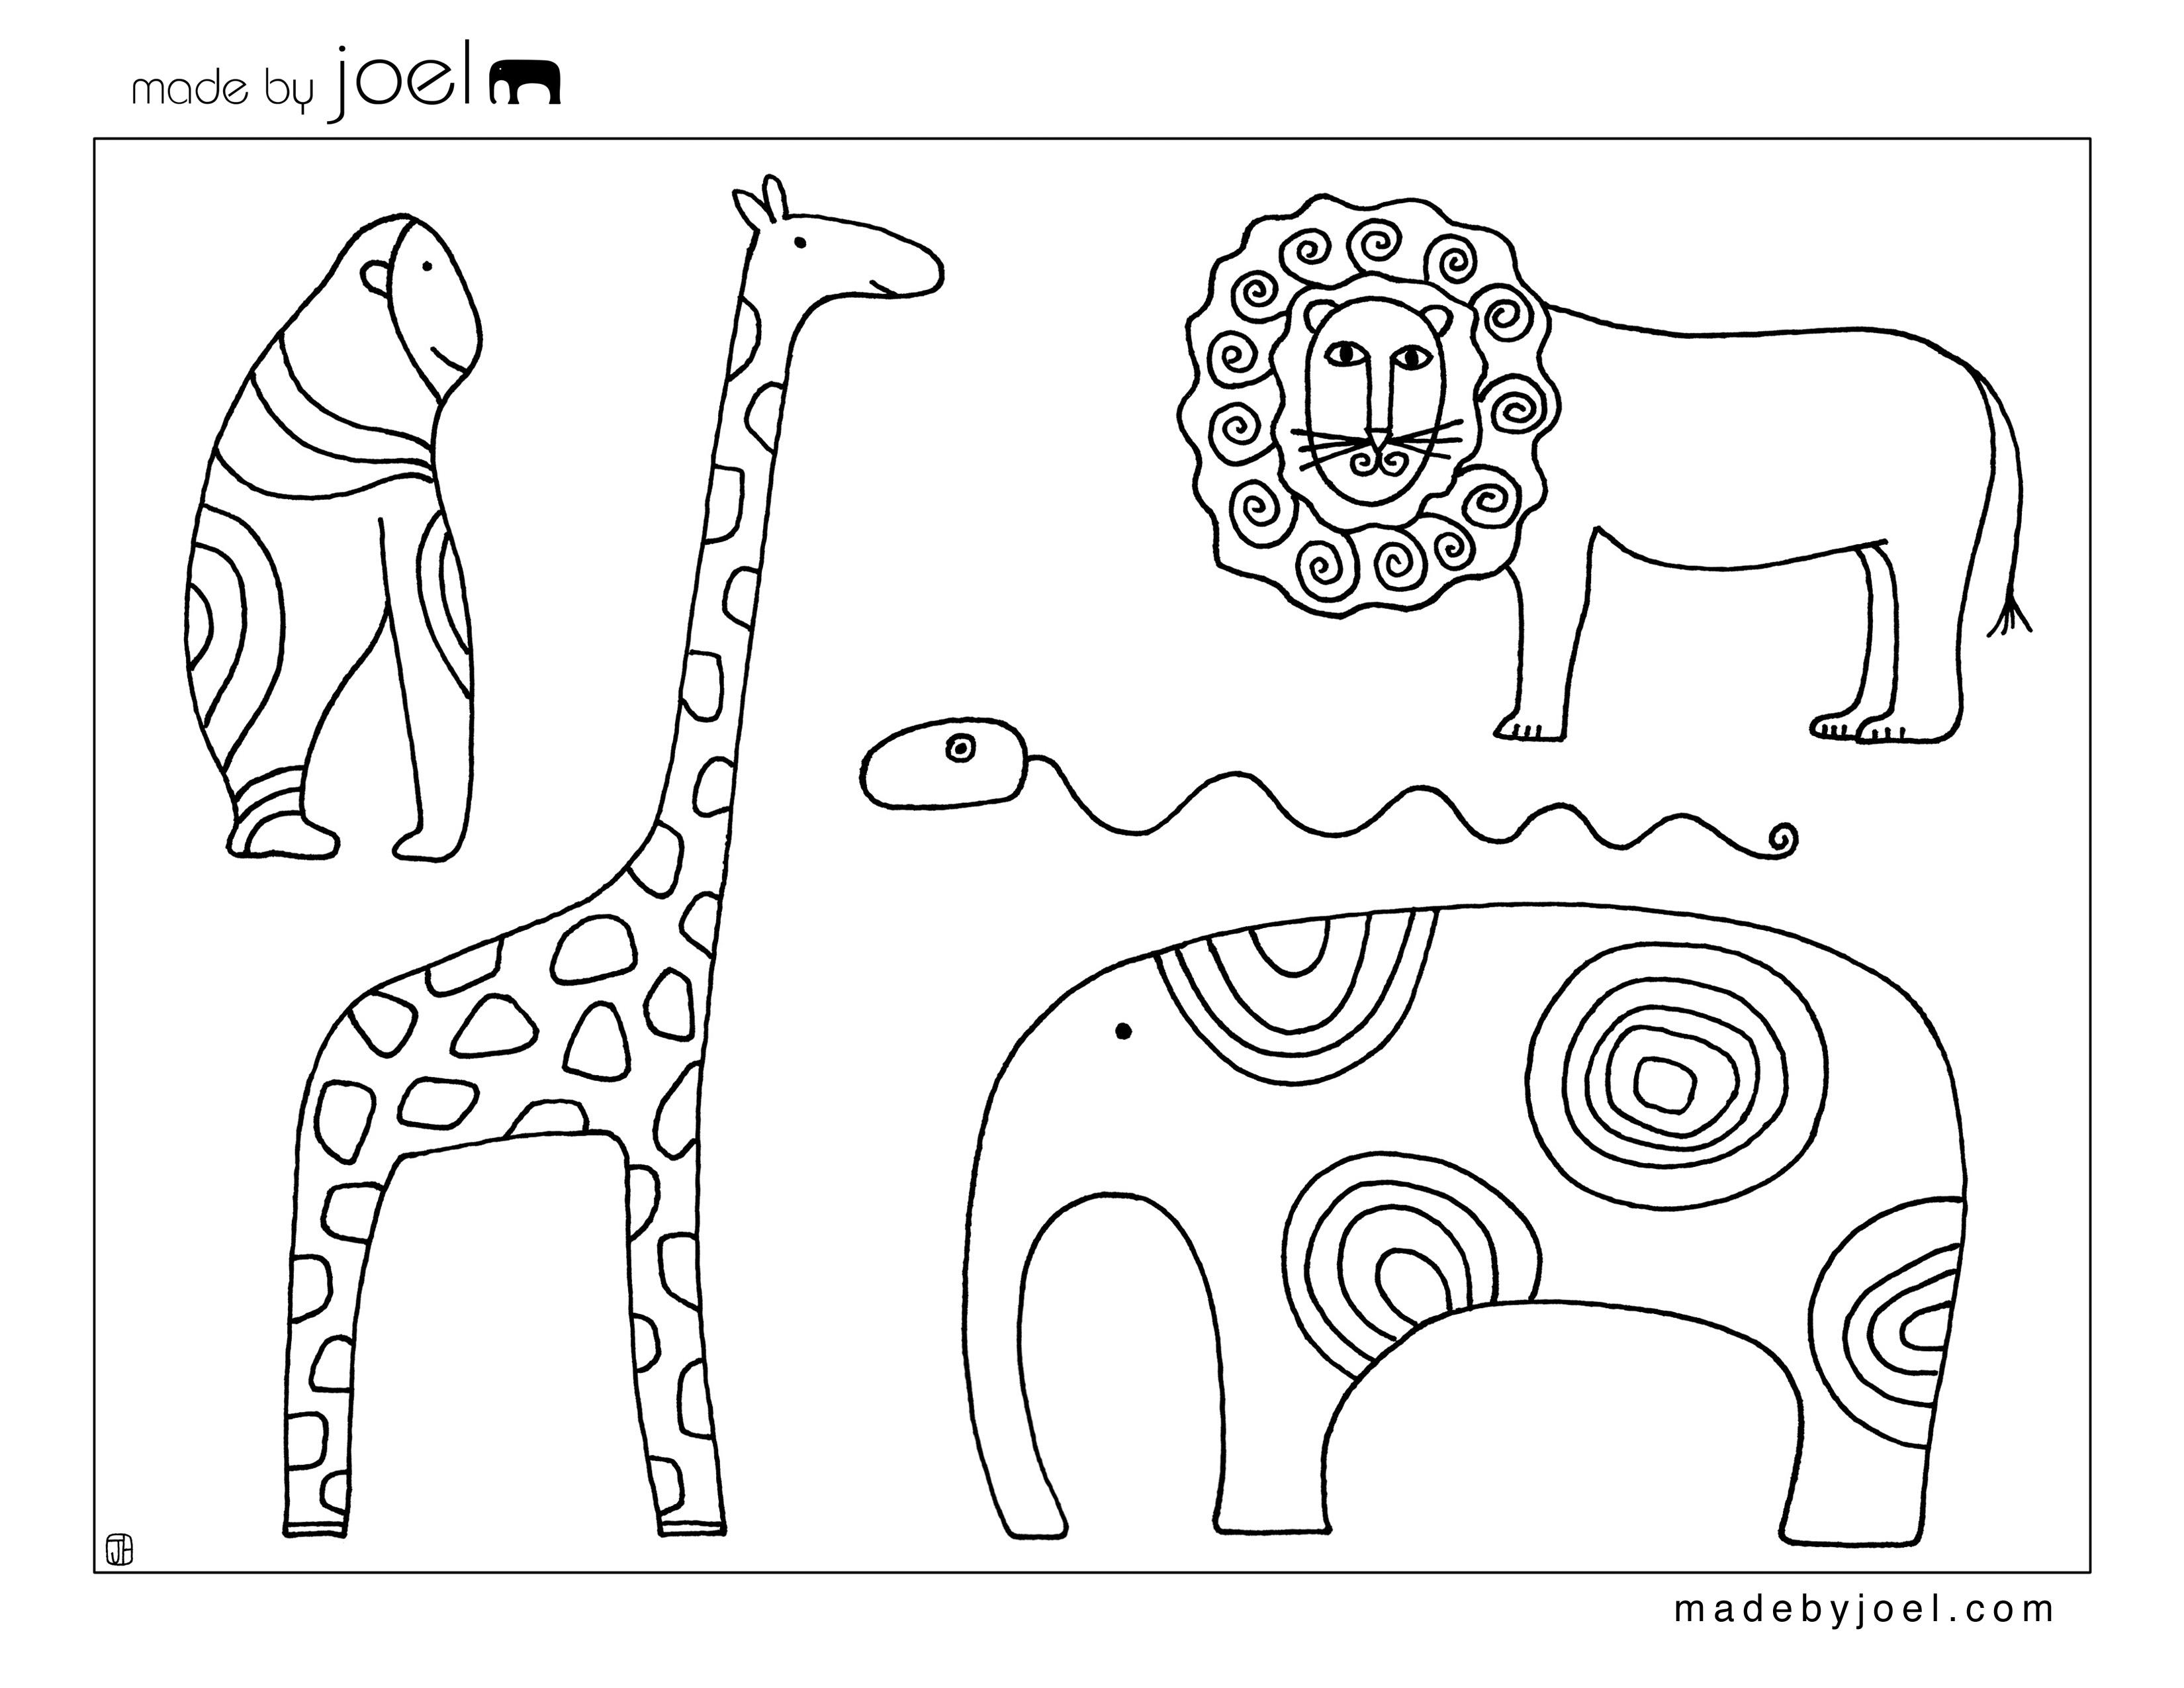 6 Images of Printable Animal Templates